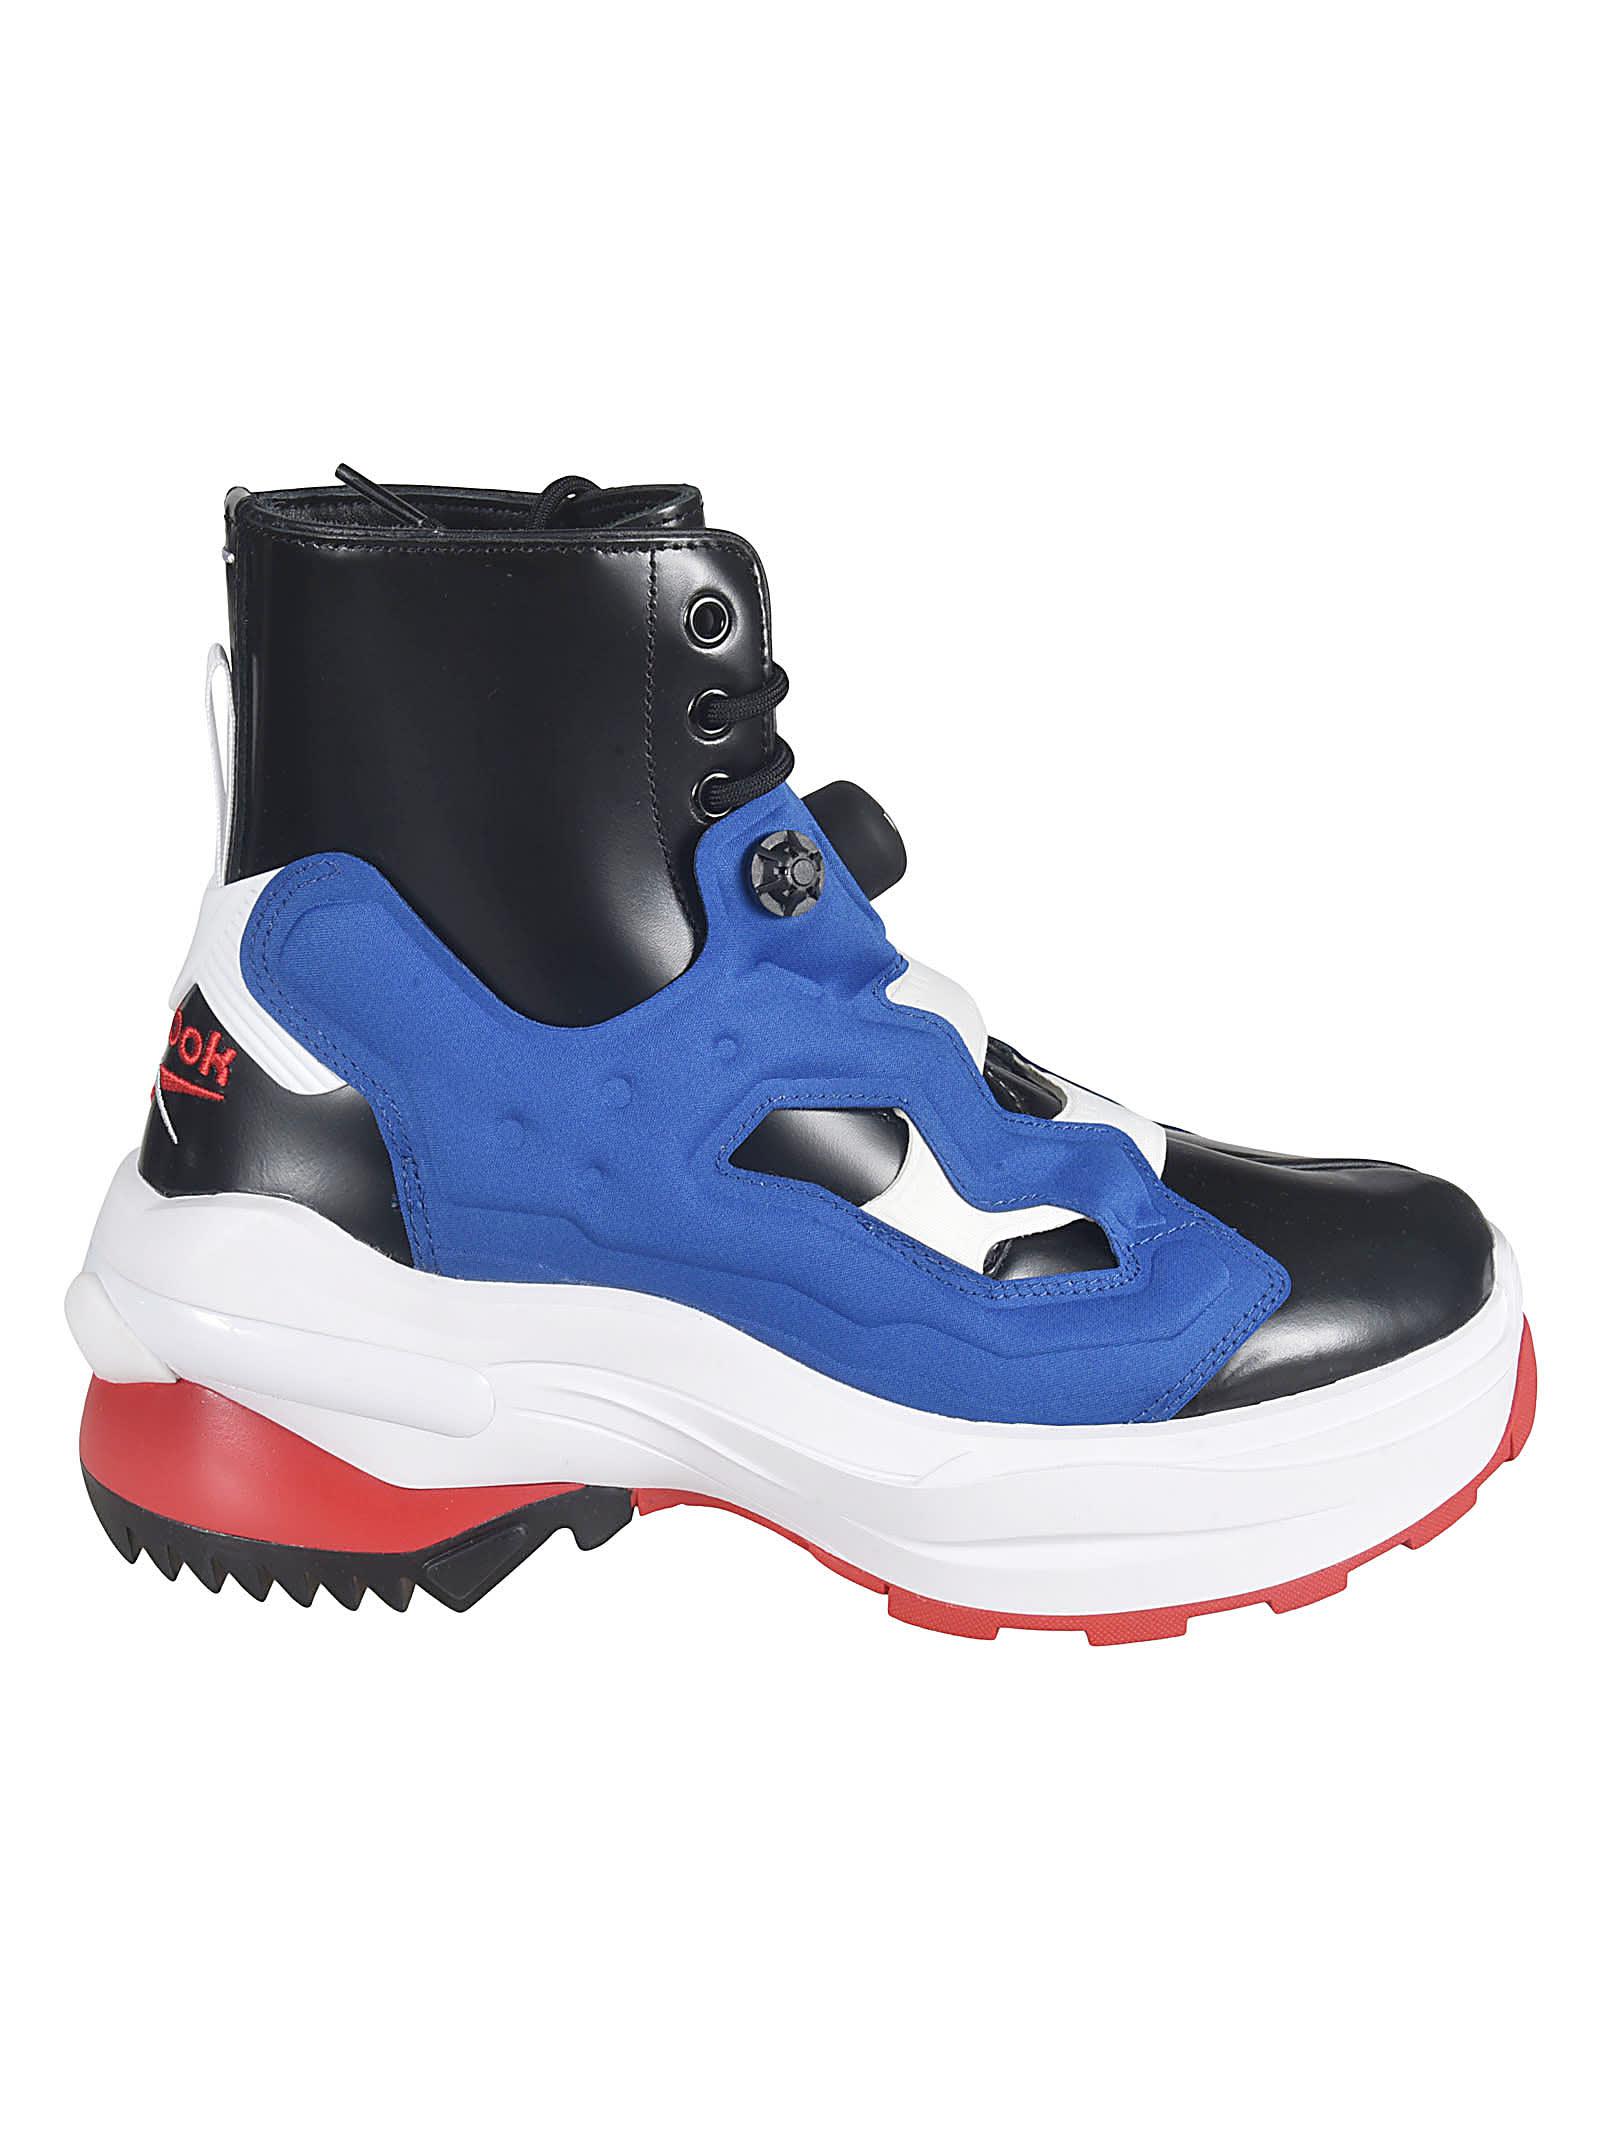 Maison Margiela Tabi Instapump Fury Boots